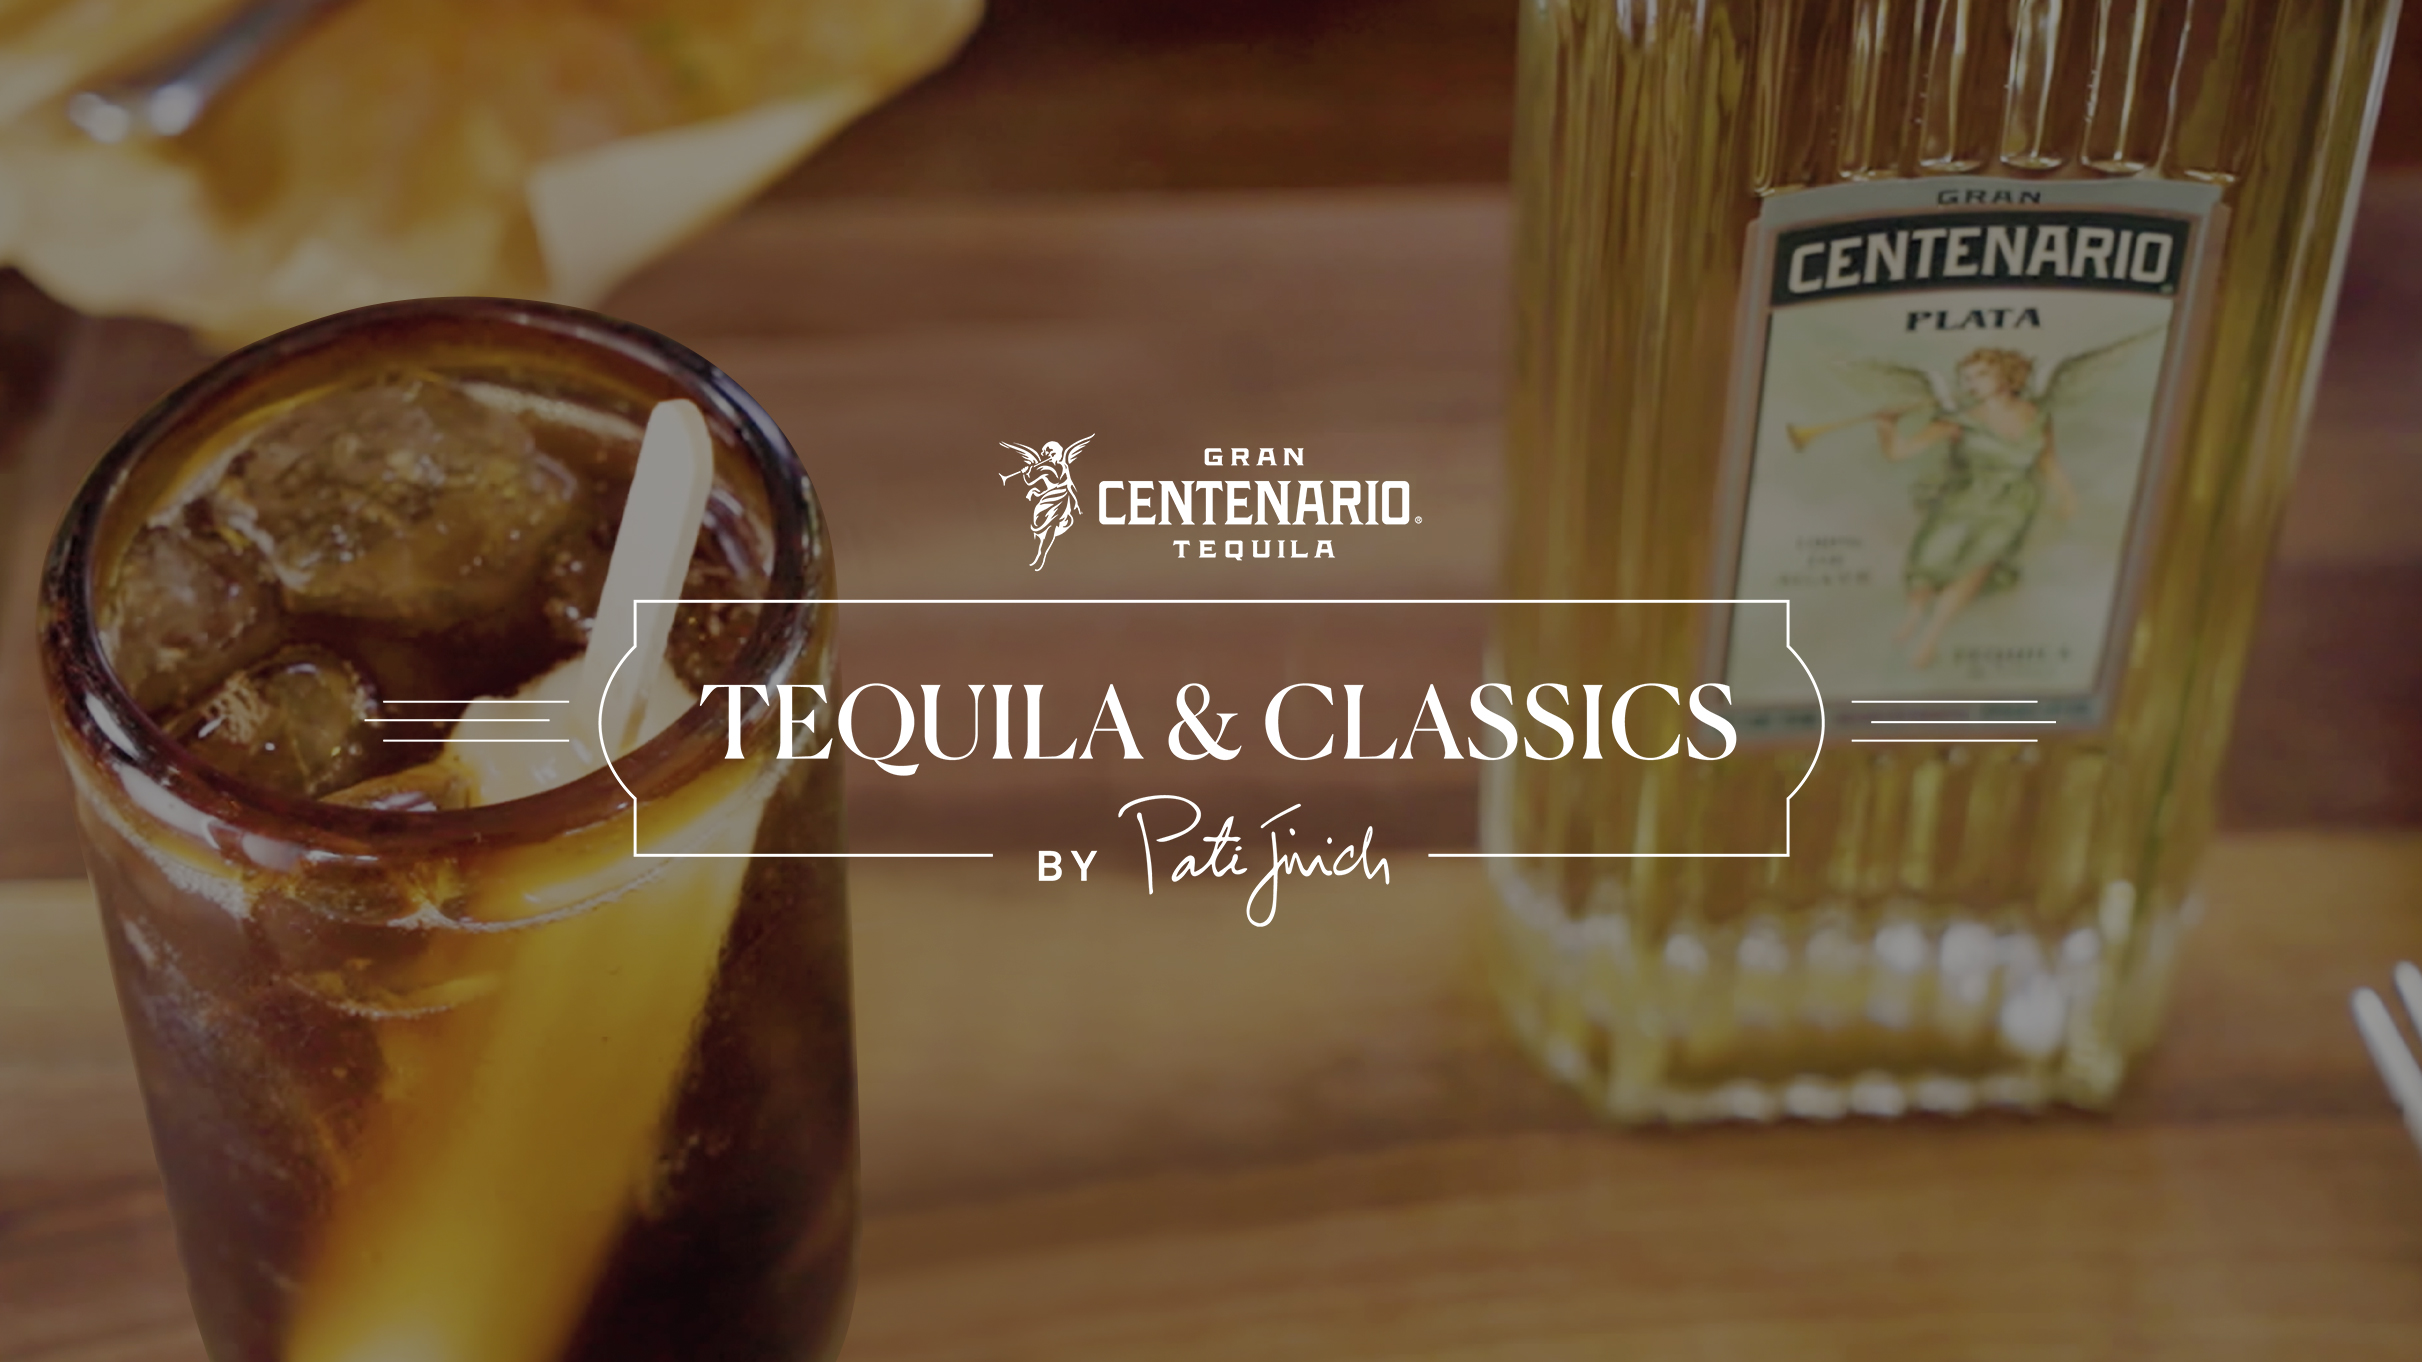 Tequila & Classics: Episodio 3